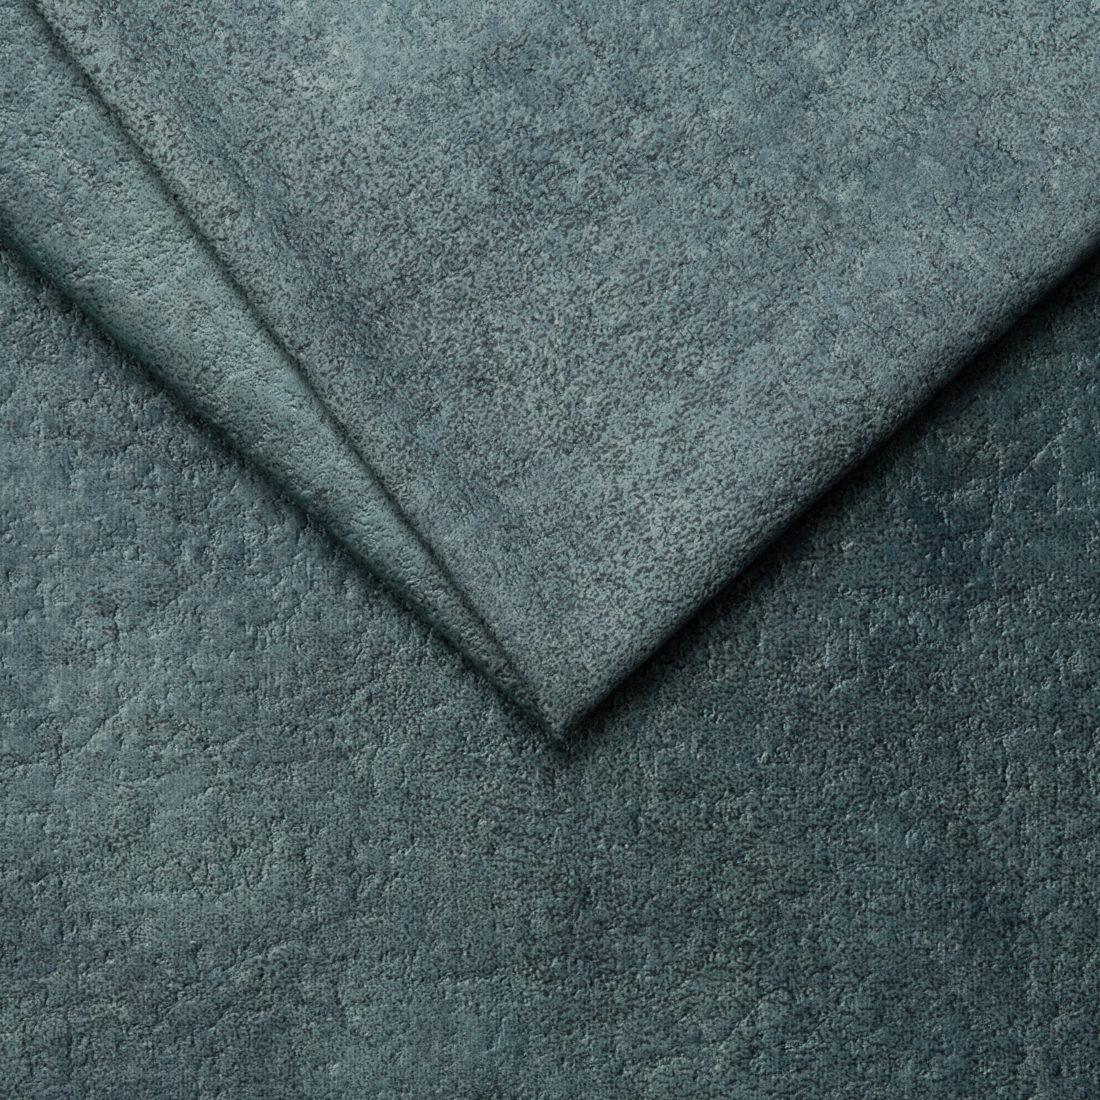 Мебельная ткань Infinity 13 Jadeite, велюр